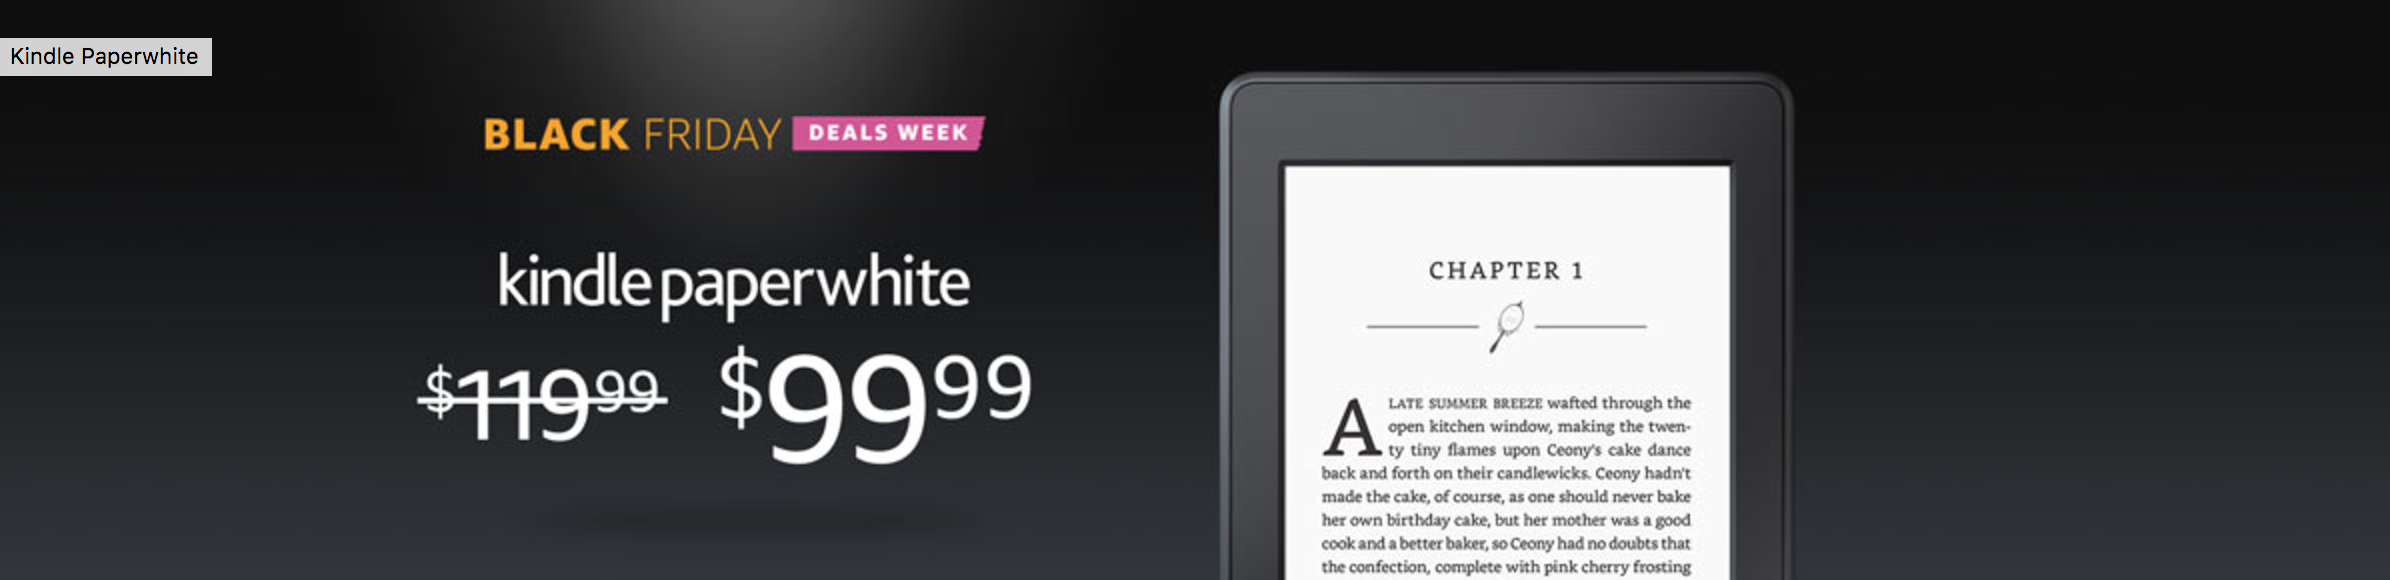 Kindle Paperwhite Black Friday – Amazon Black Friday Deals